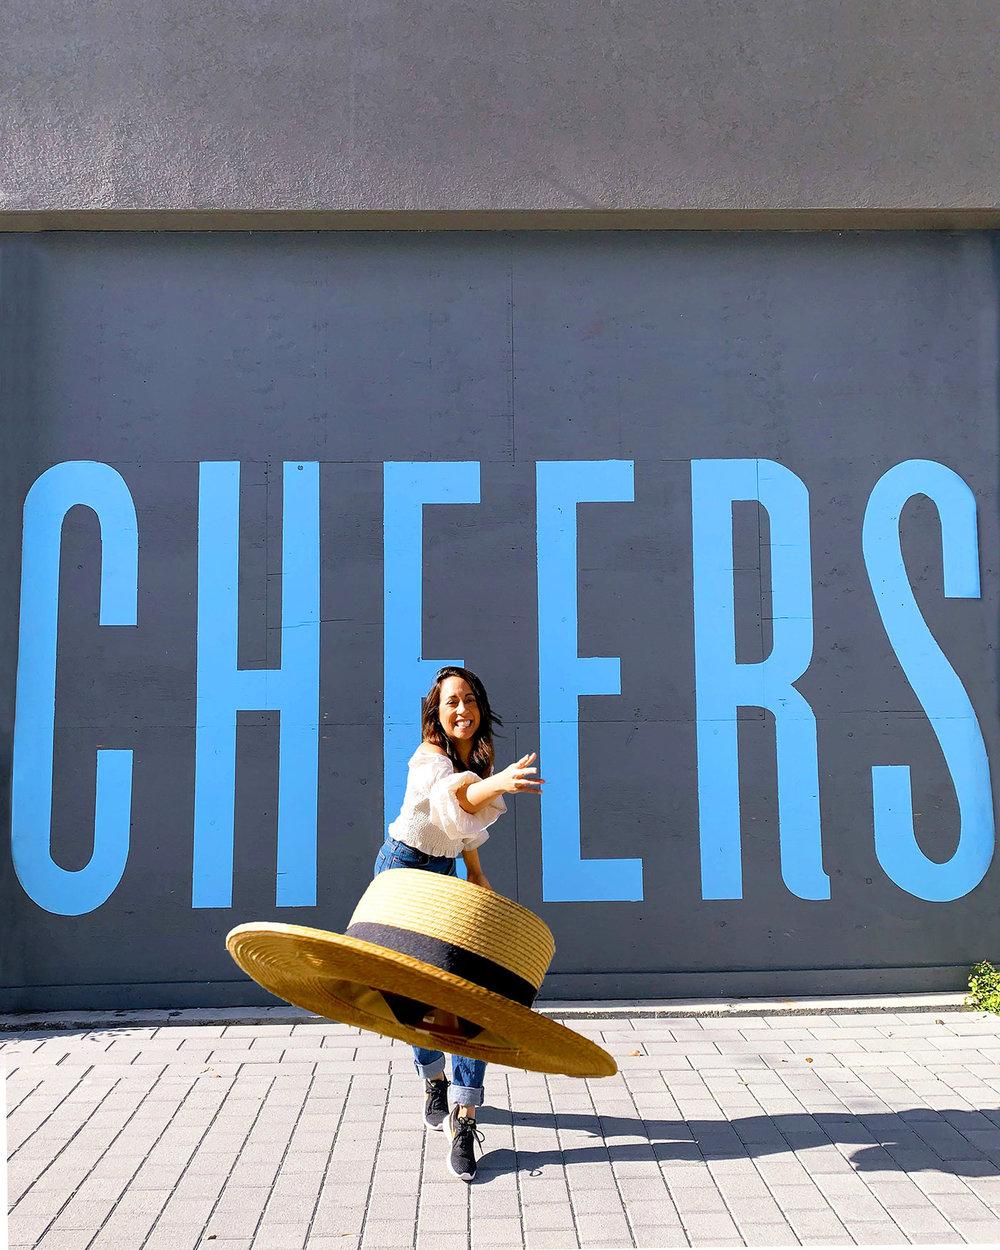 Downtown Napa Cheers wall art